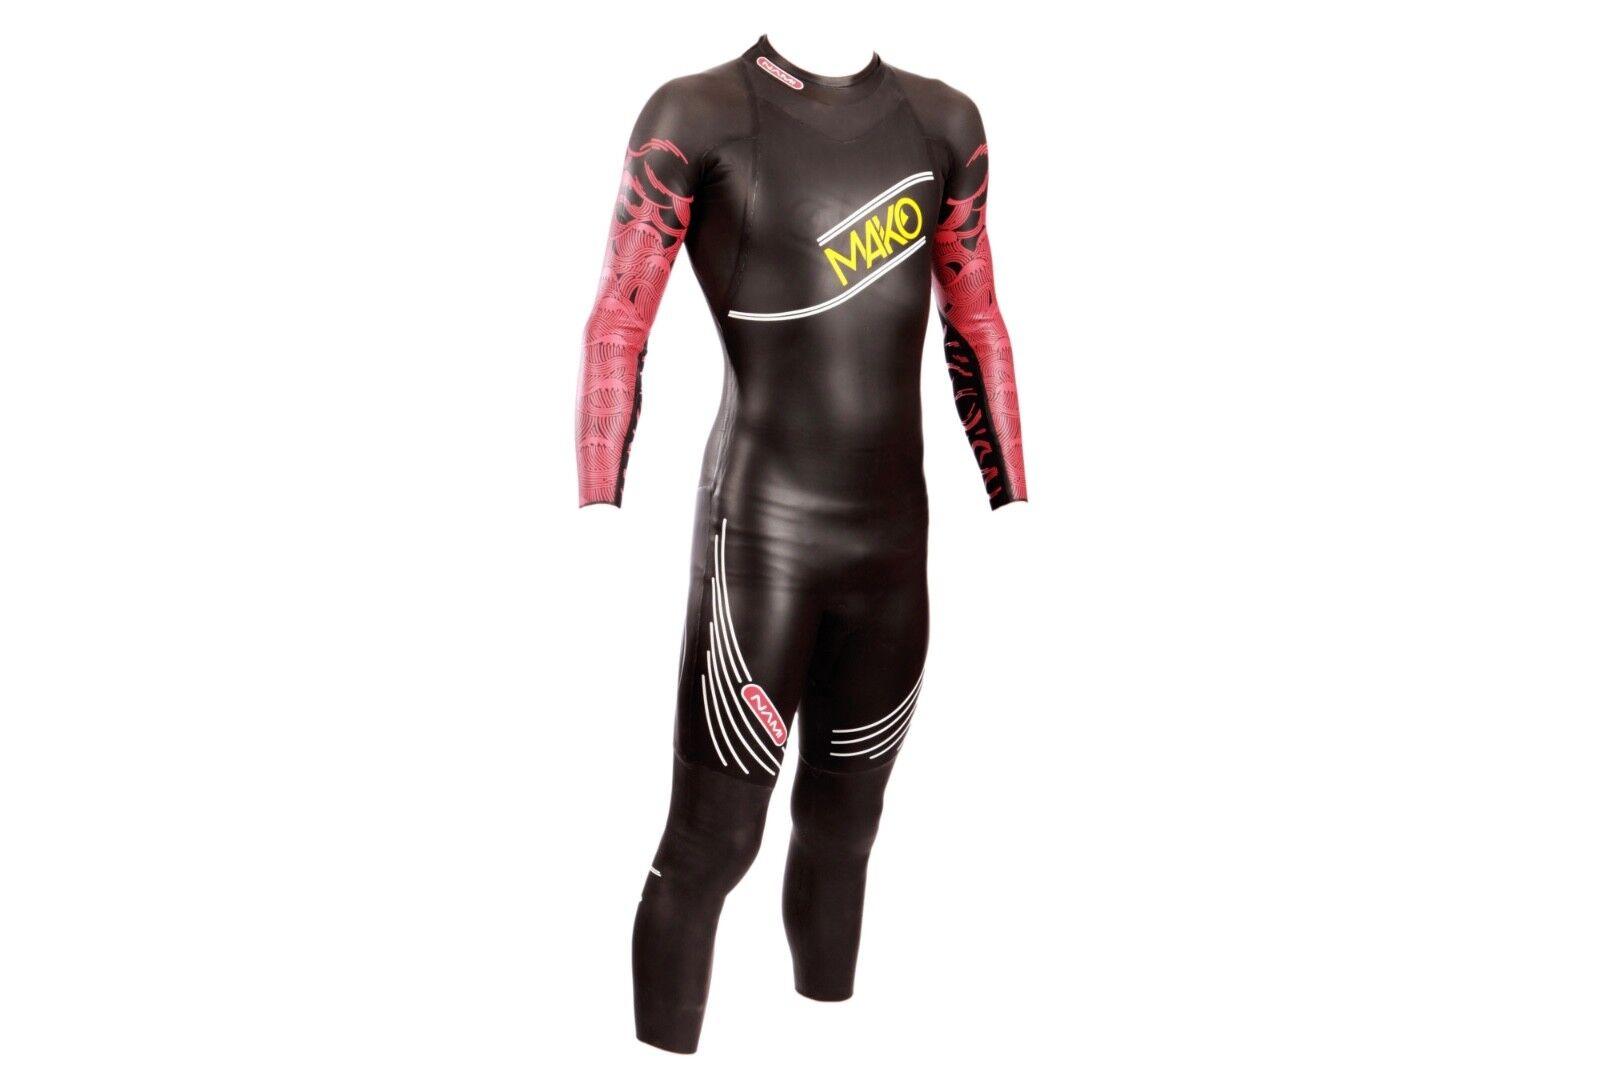 MAKO NAMI 2017 Wetsuit Triathlon Swimming Diving Surfing Men's M RRP  Water